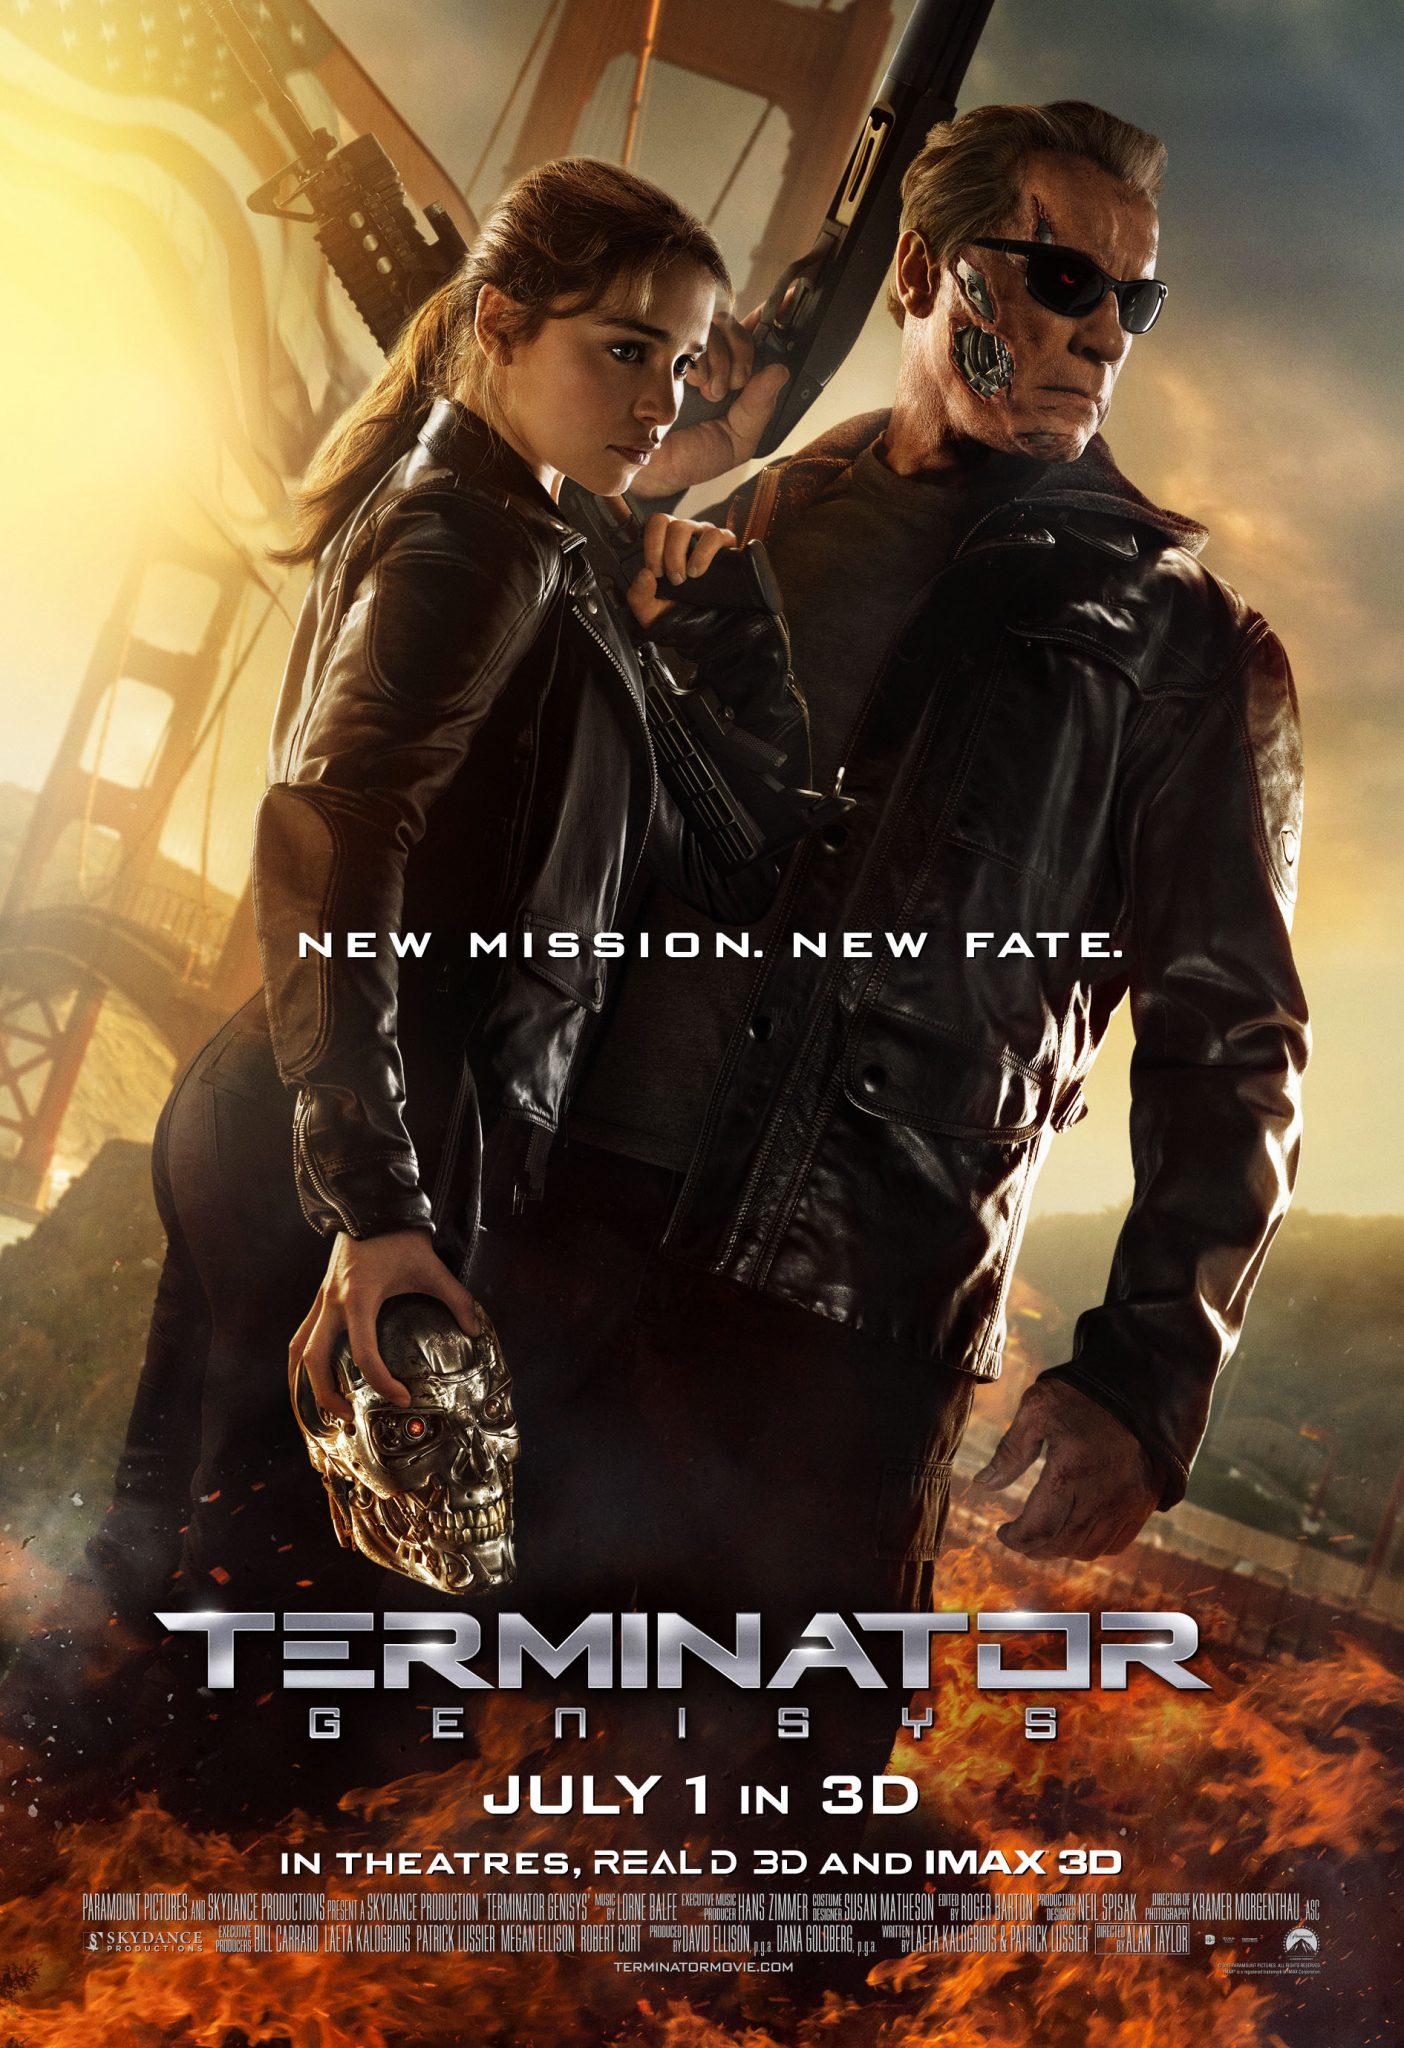 New Movie: Terminator Genisys